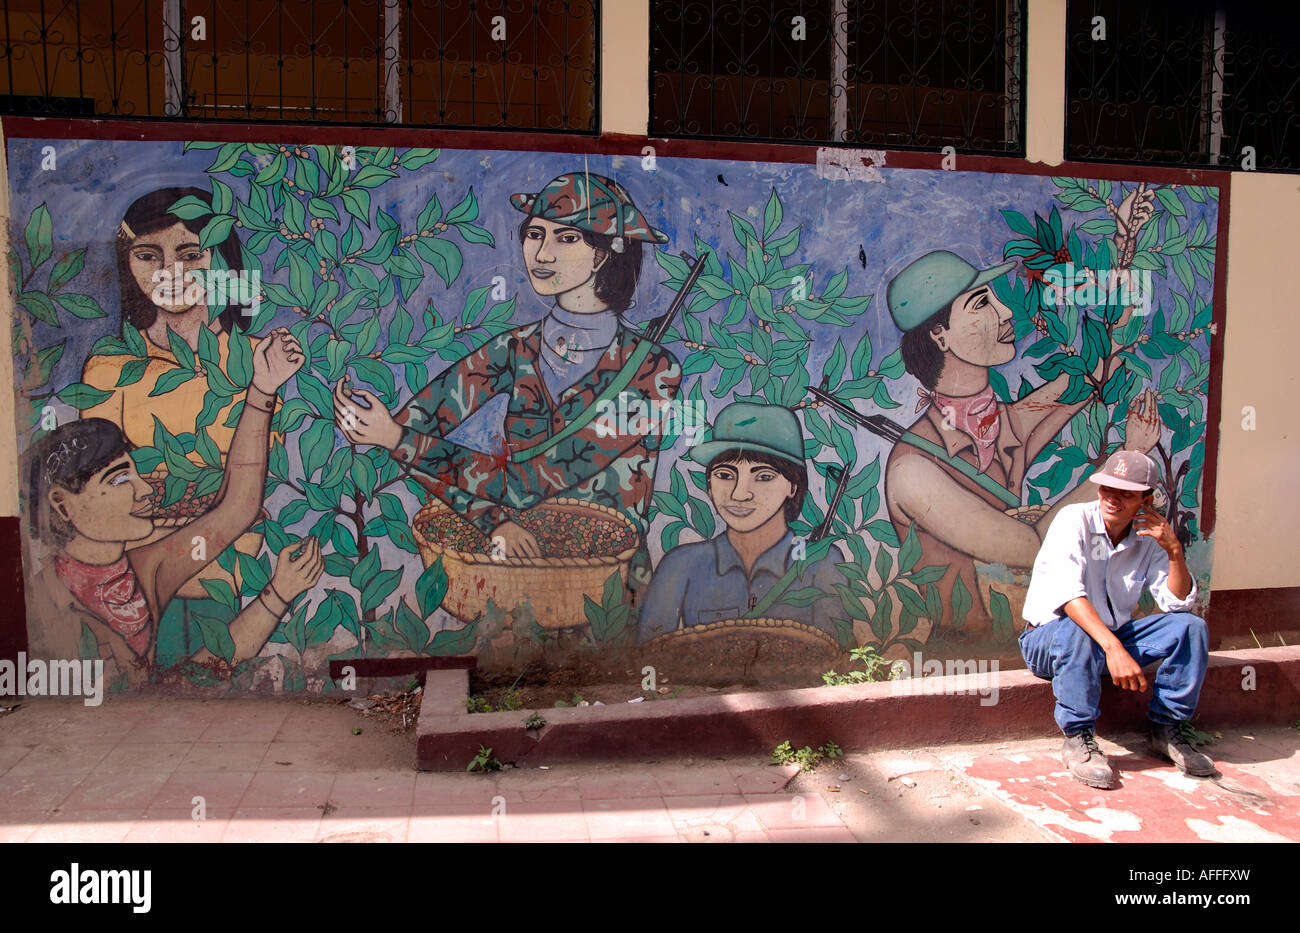 Man sitting in front of revolutionary wall mural, Jinotega, Nicaragua Stock Photo